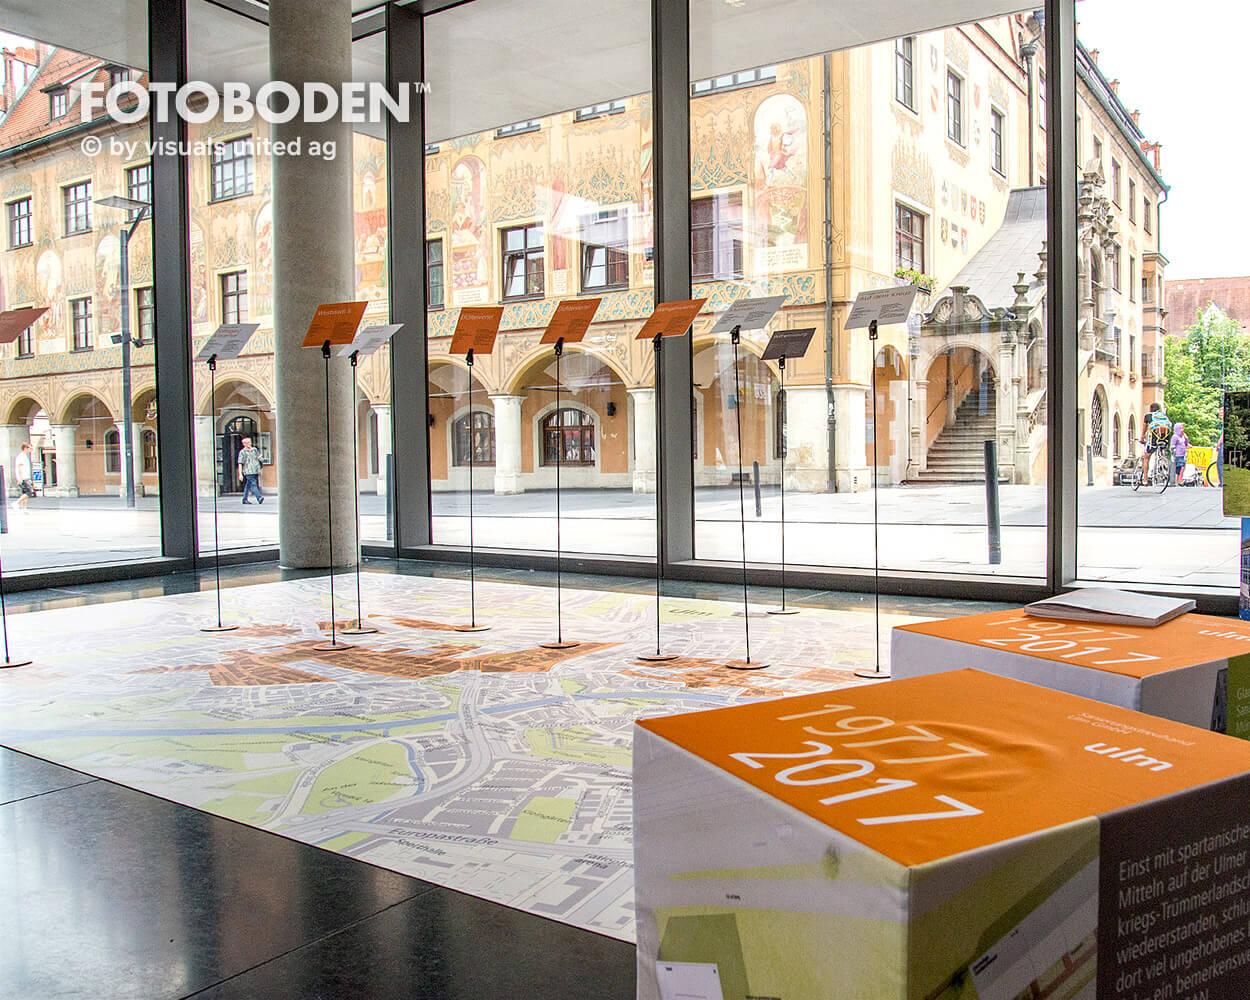 Sparkasse Ulm Ausstellung Museum  Raumkonzept Stimmung Museumsboden Ausstellungsboden Fotoboden Vinylboden Flooring Individuell Event1